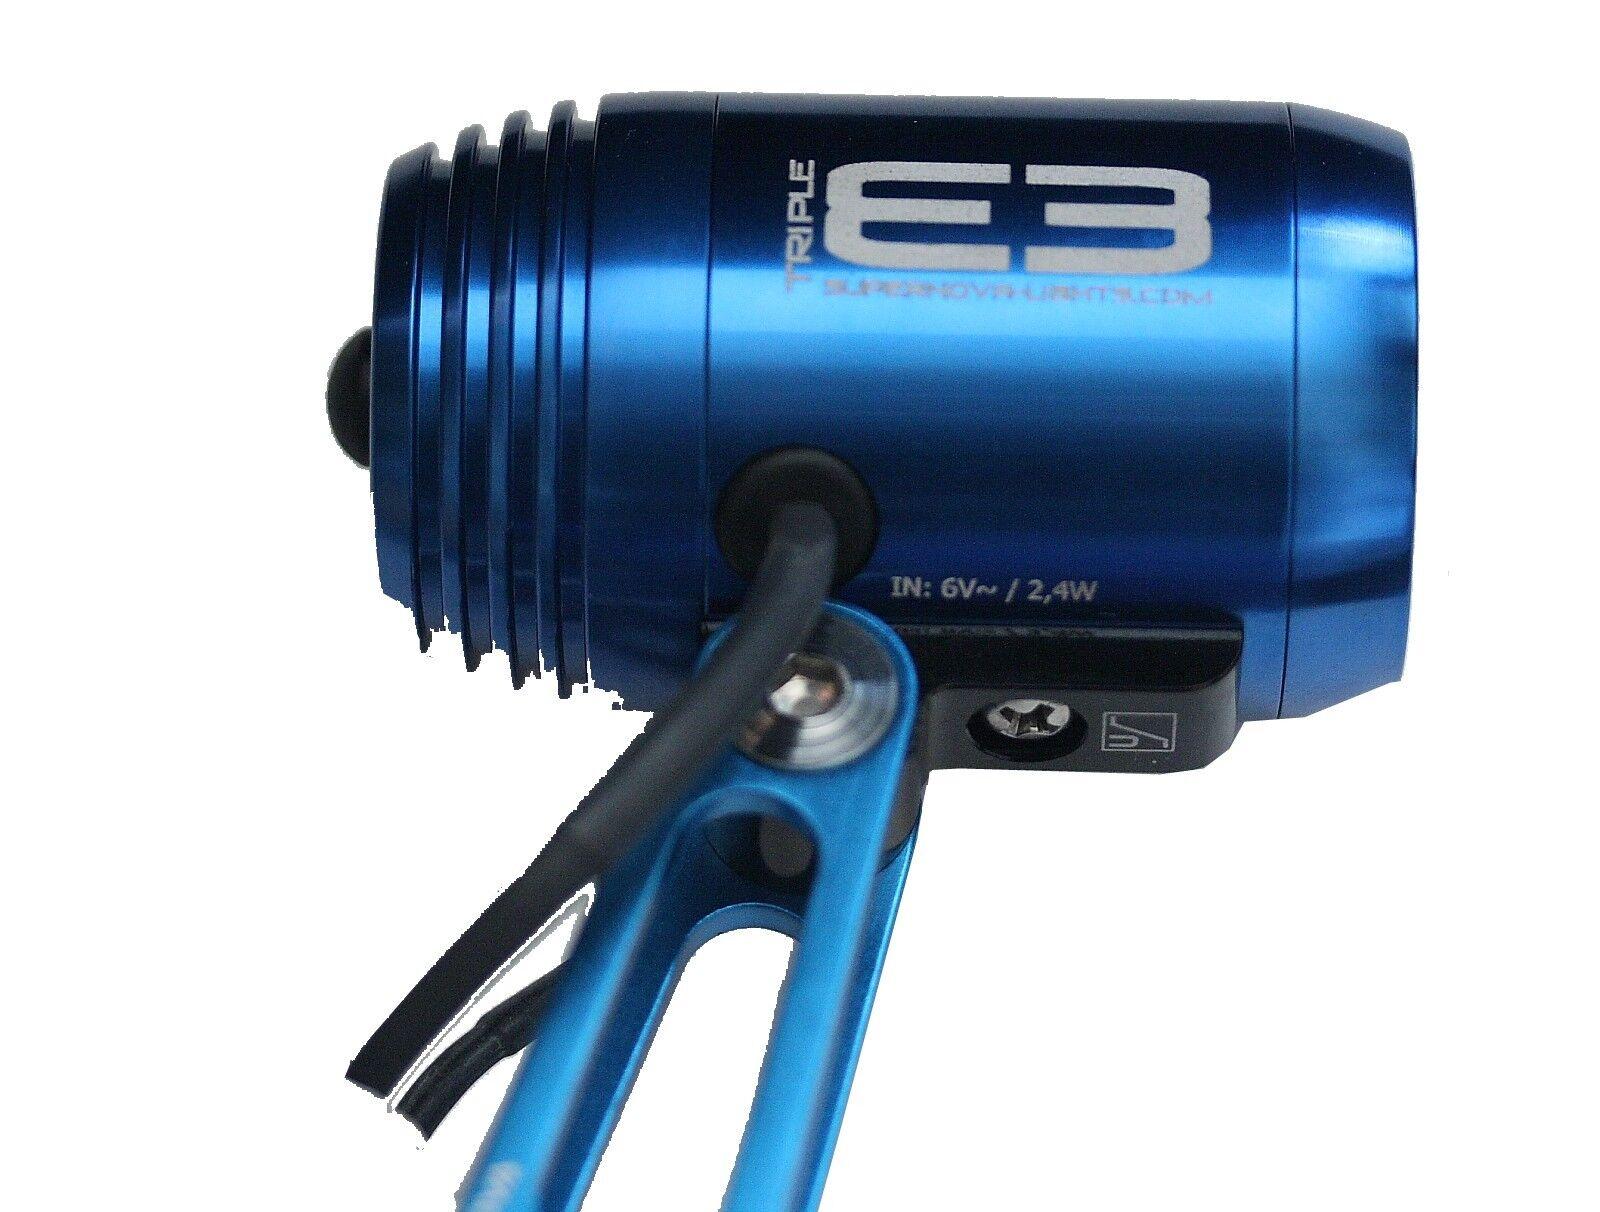 SUPERNOVA Frontscheinwerfer E3 triple blue 800 Lumen